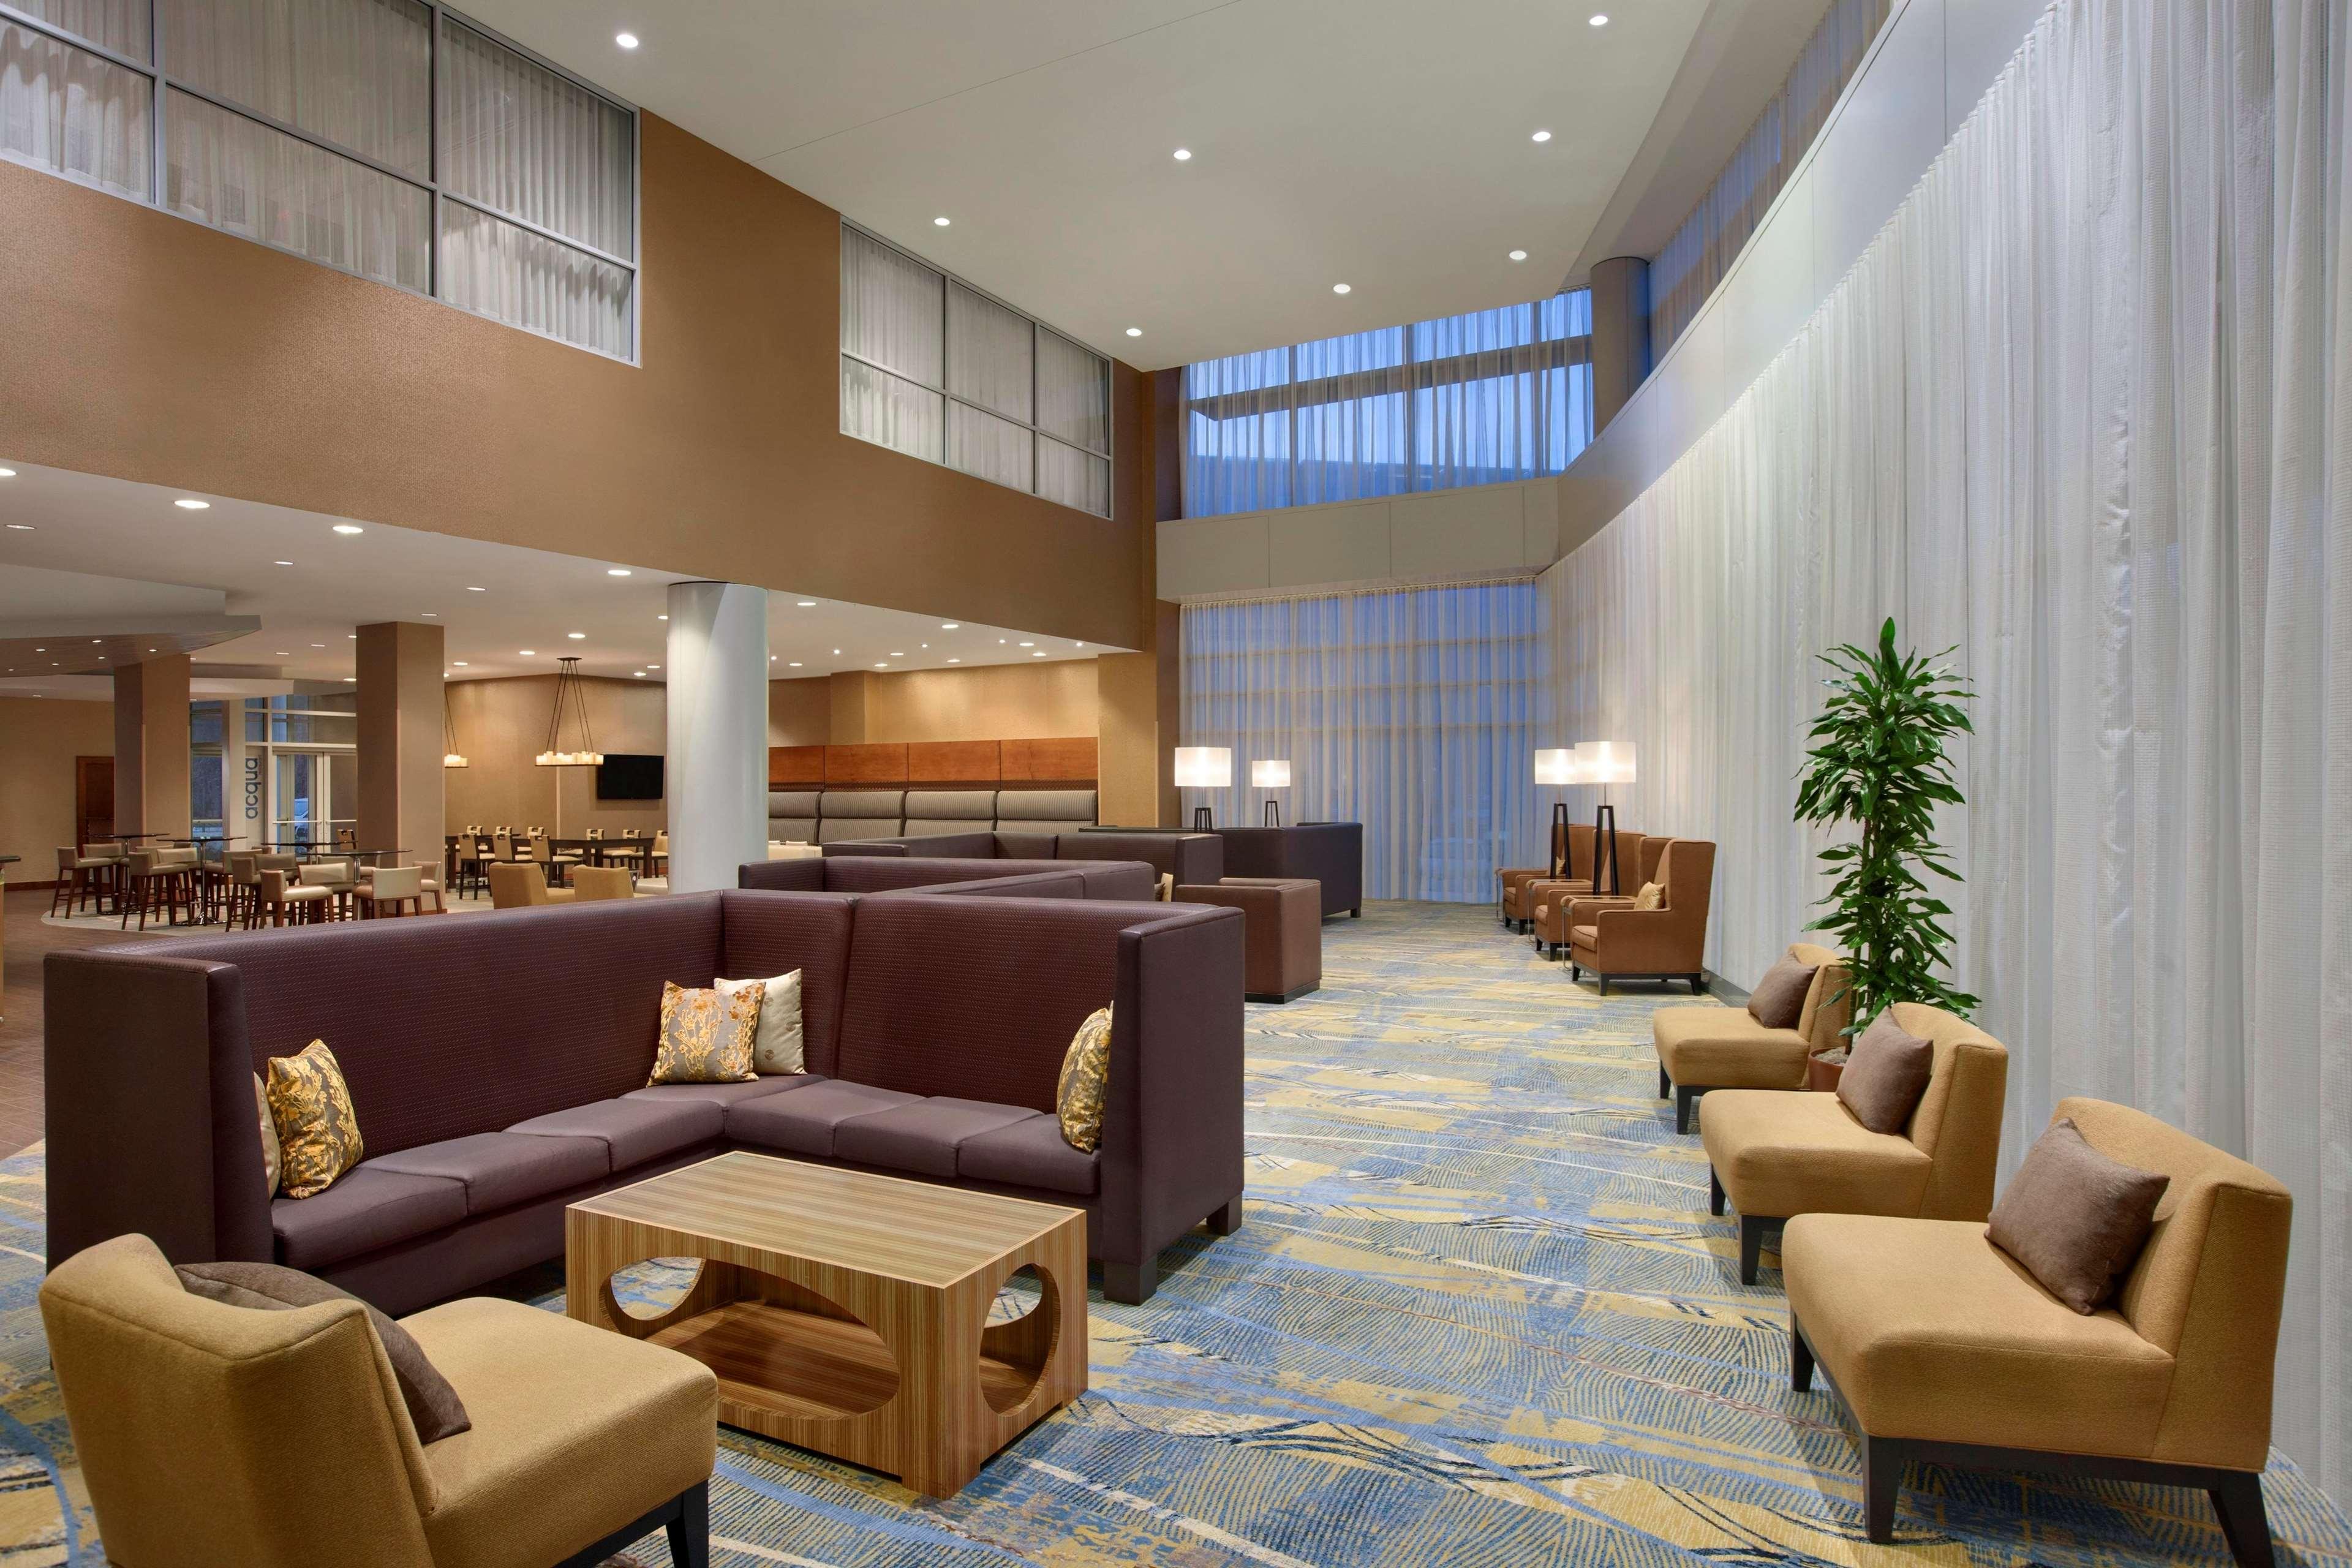 Hilton Baltimore BWI Airport image 0